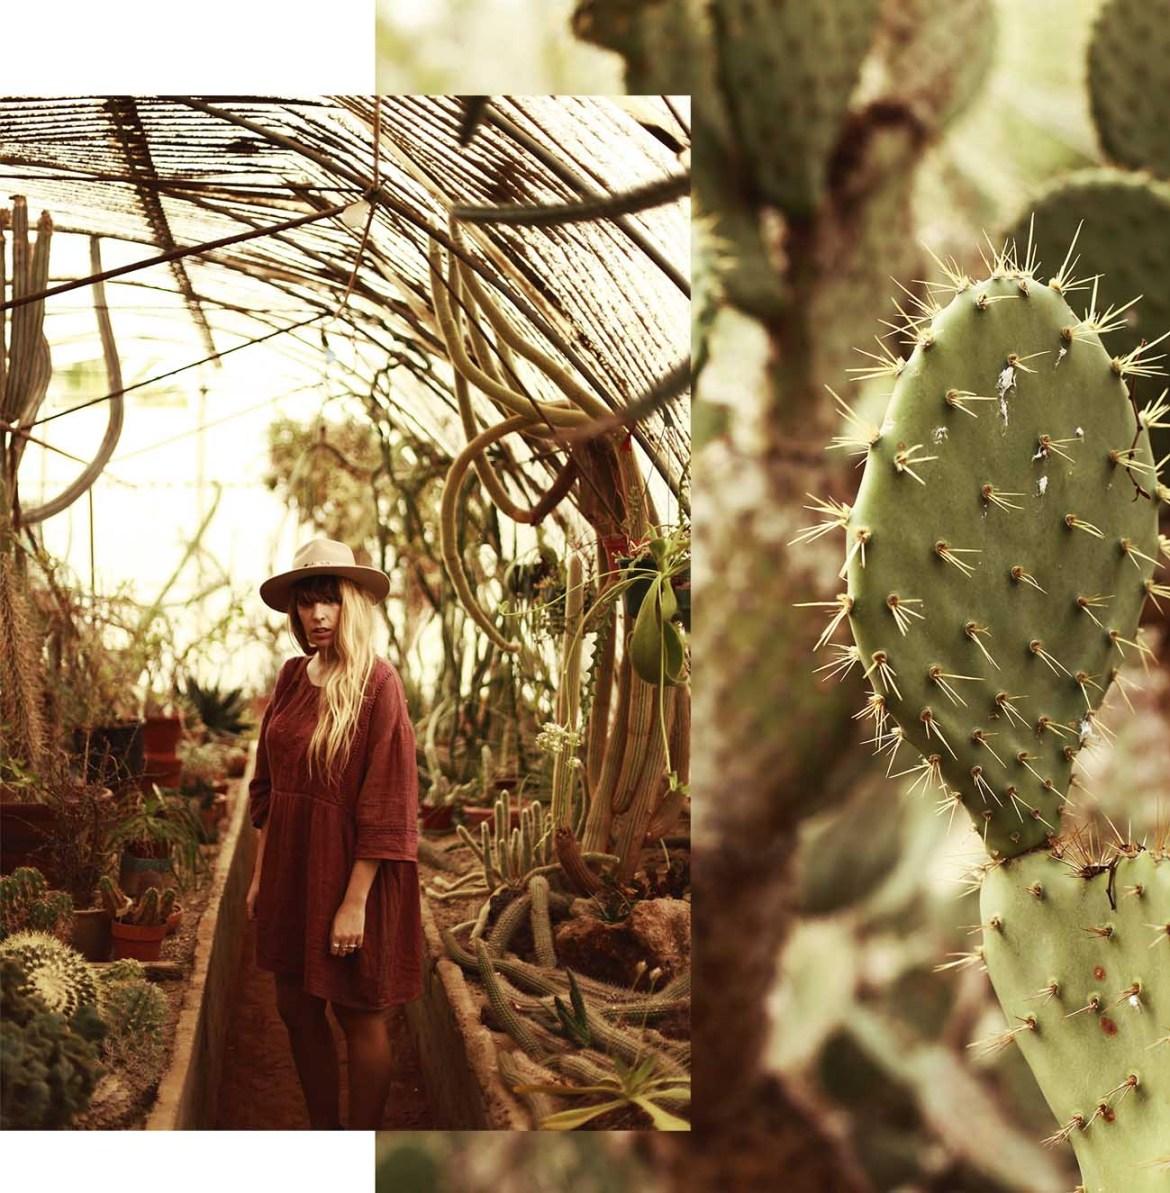 cacti-garden-palmsprings